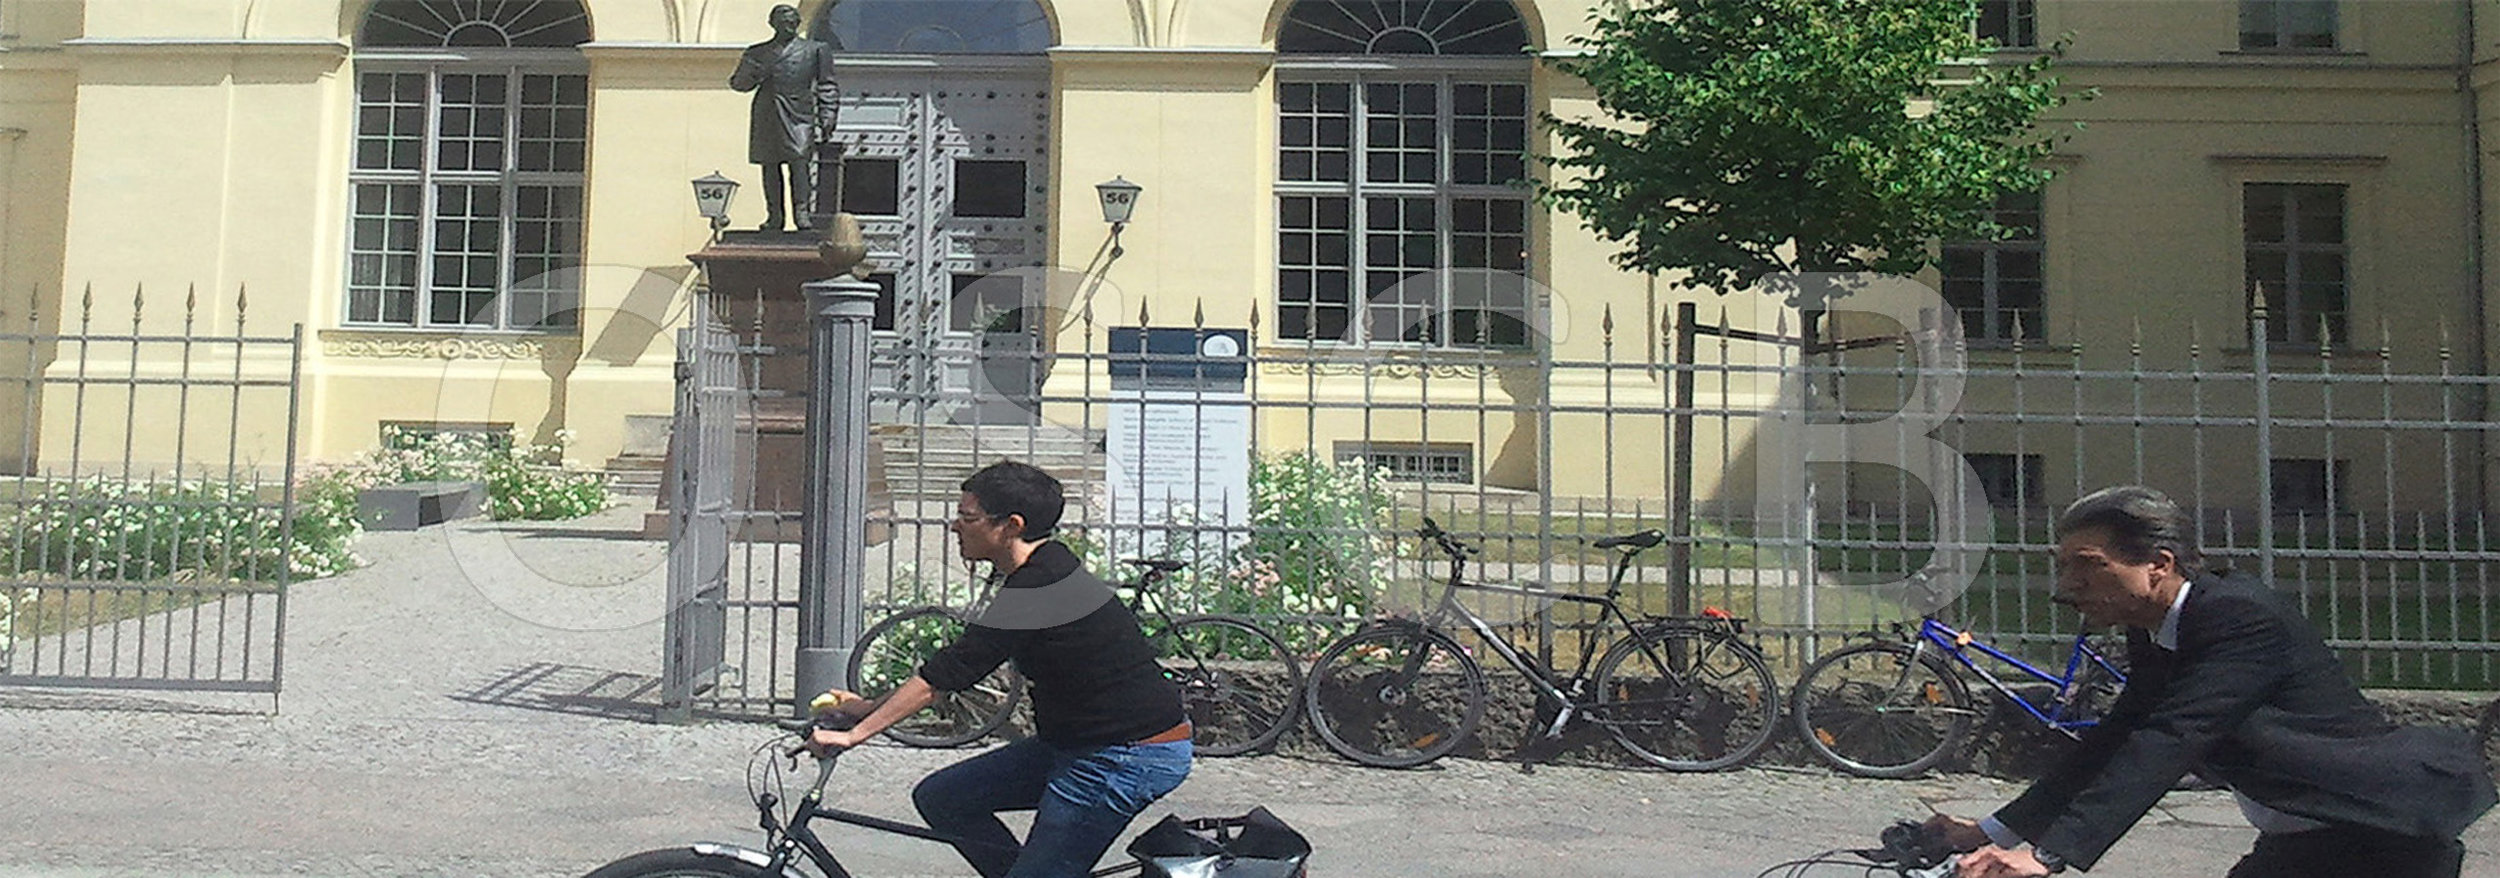 OSCB-BERLIN.org__HU Graduate School 2_OPT_2014-06-18 14_STREIFEN 900p hoch mit Fahrrädern + OSCB.jpg